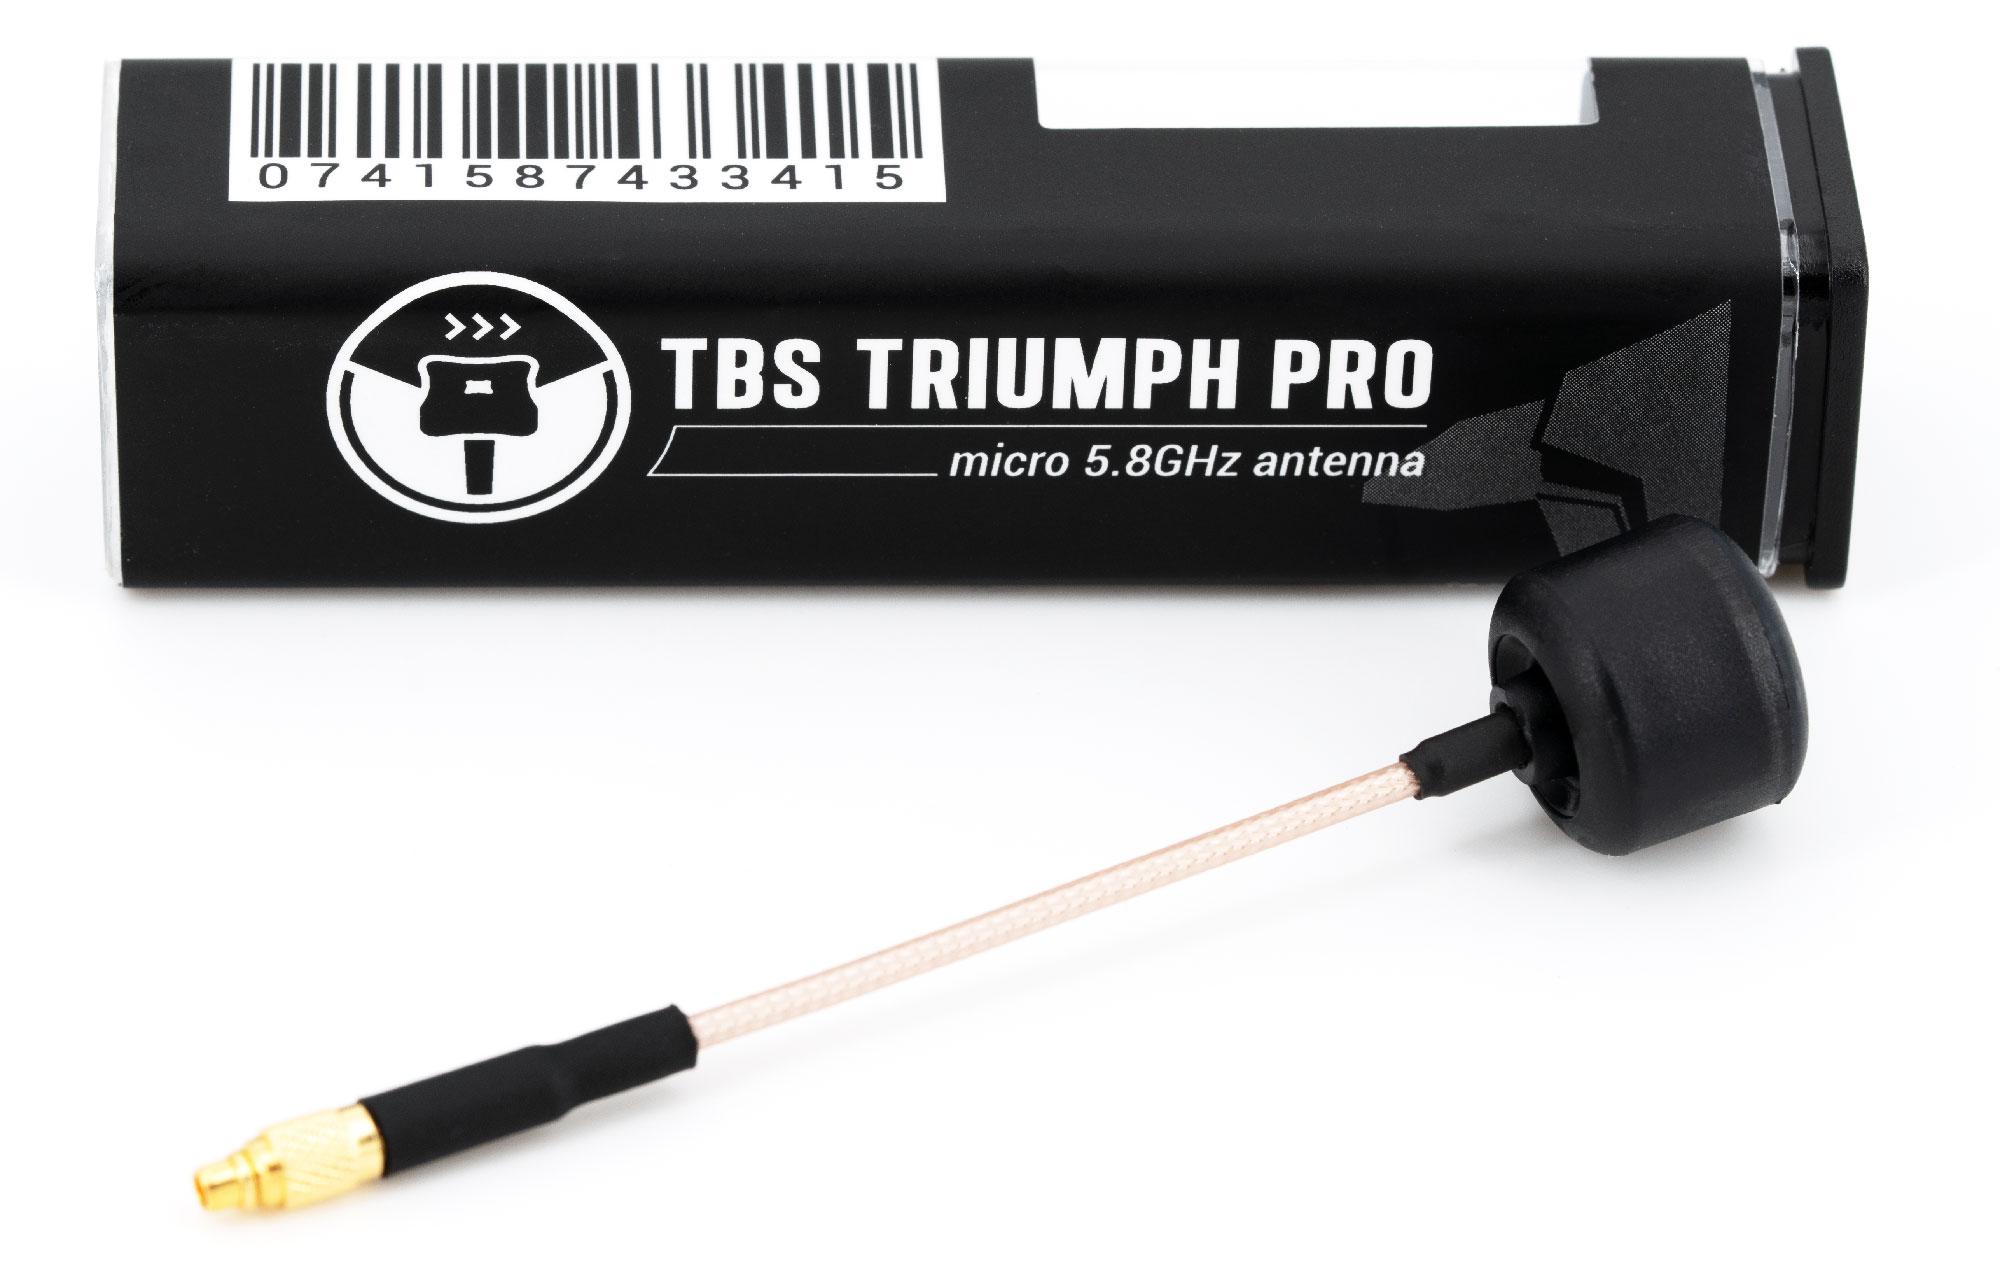 tbs-triumph-pro-mmcx-antenna_3.jpg